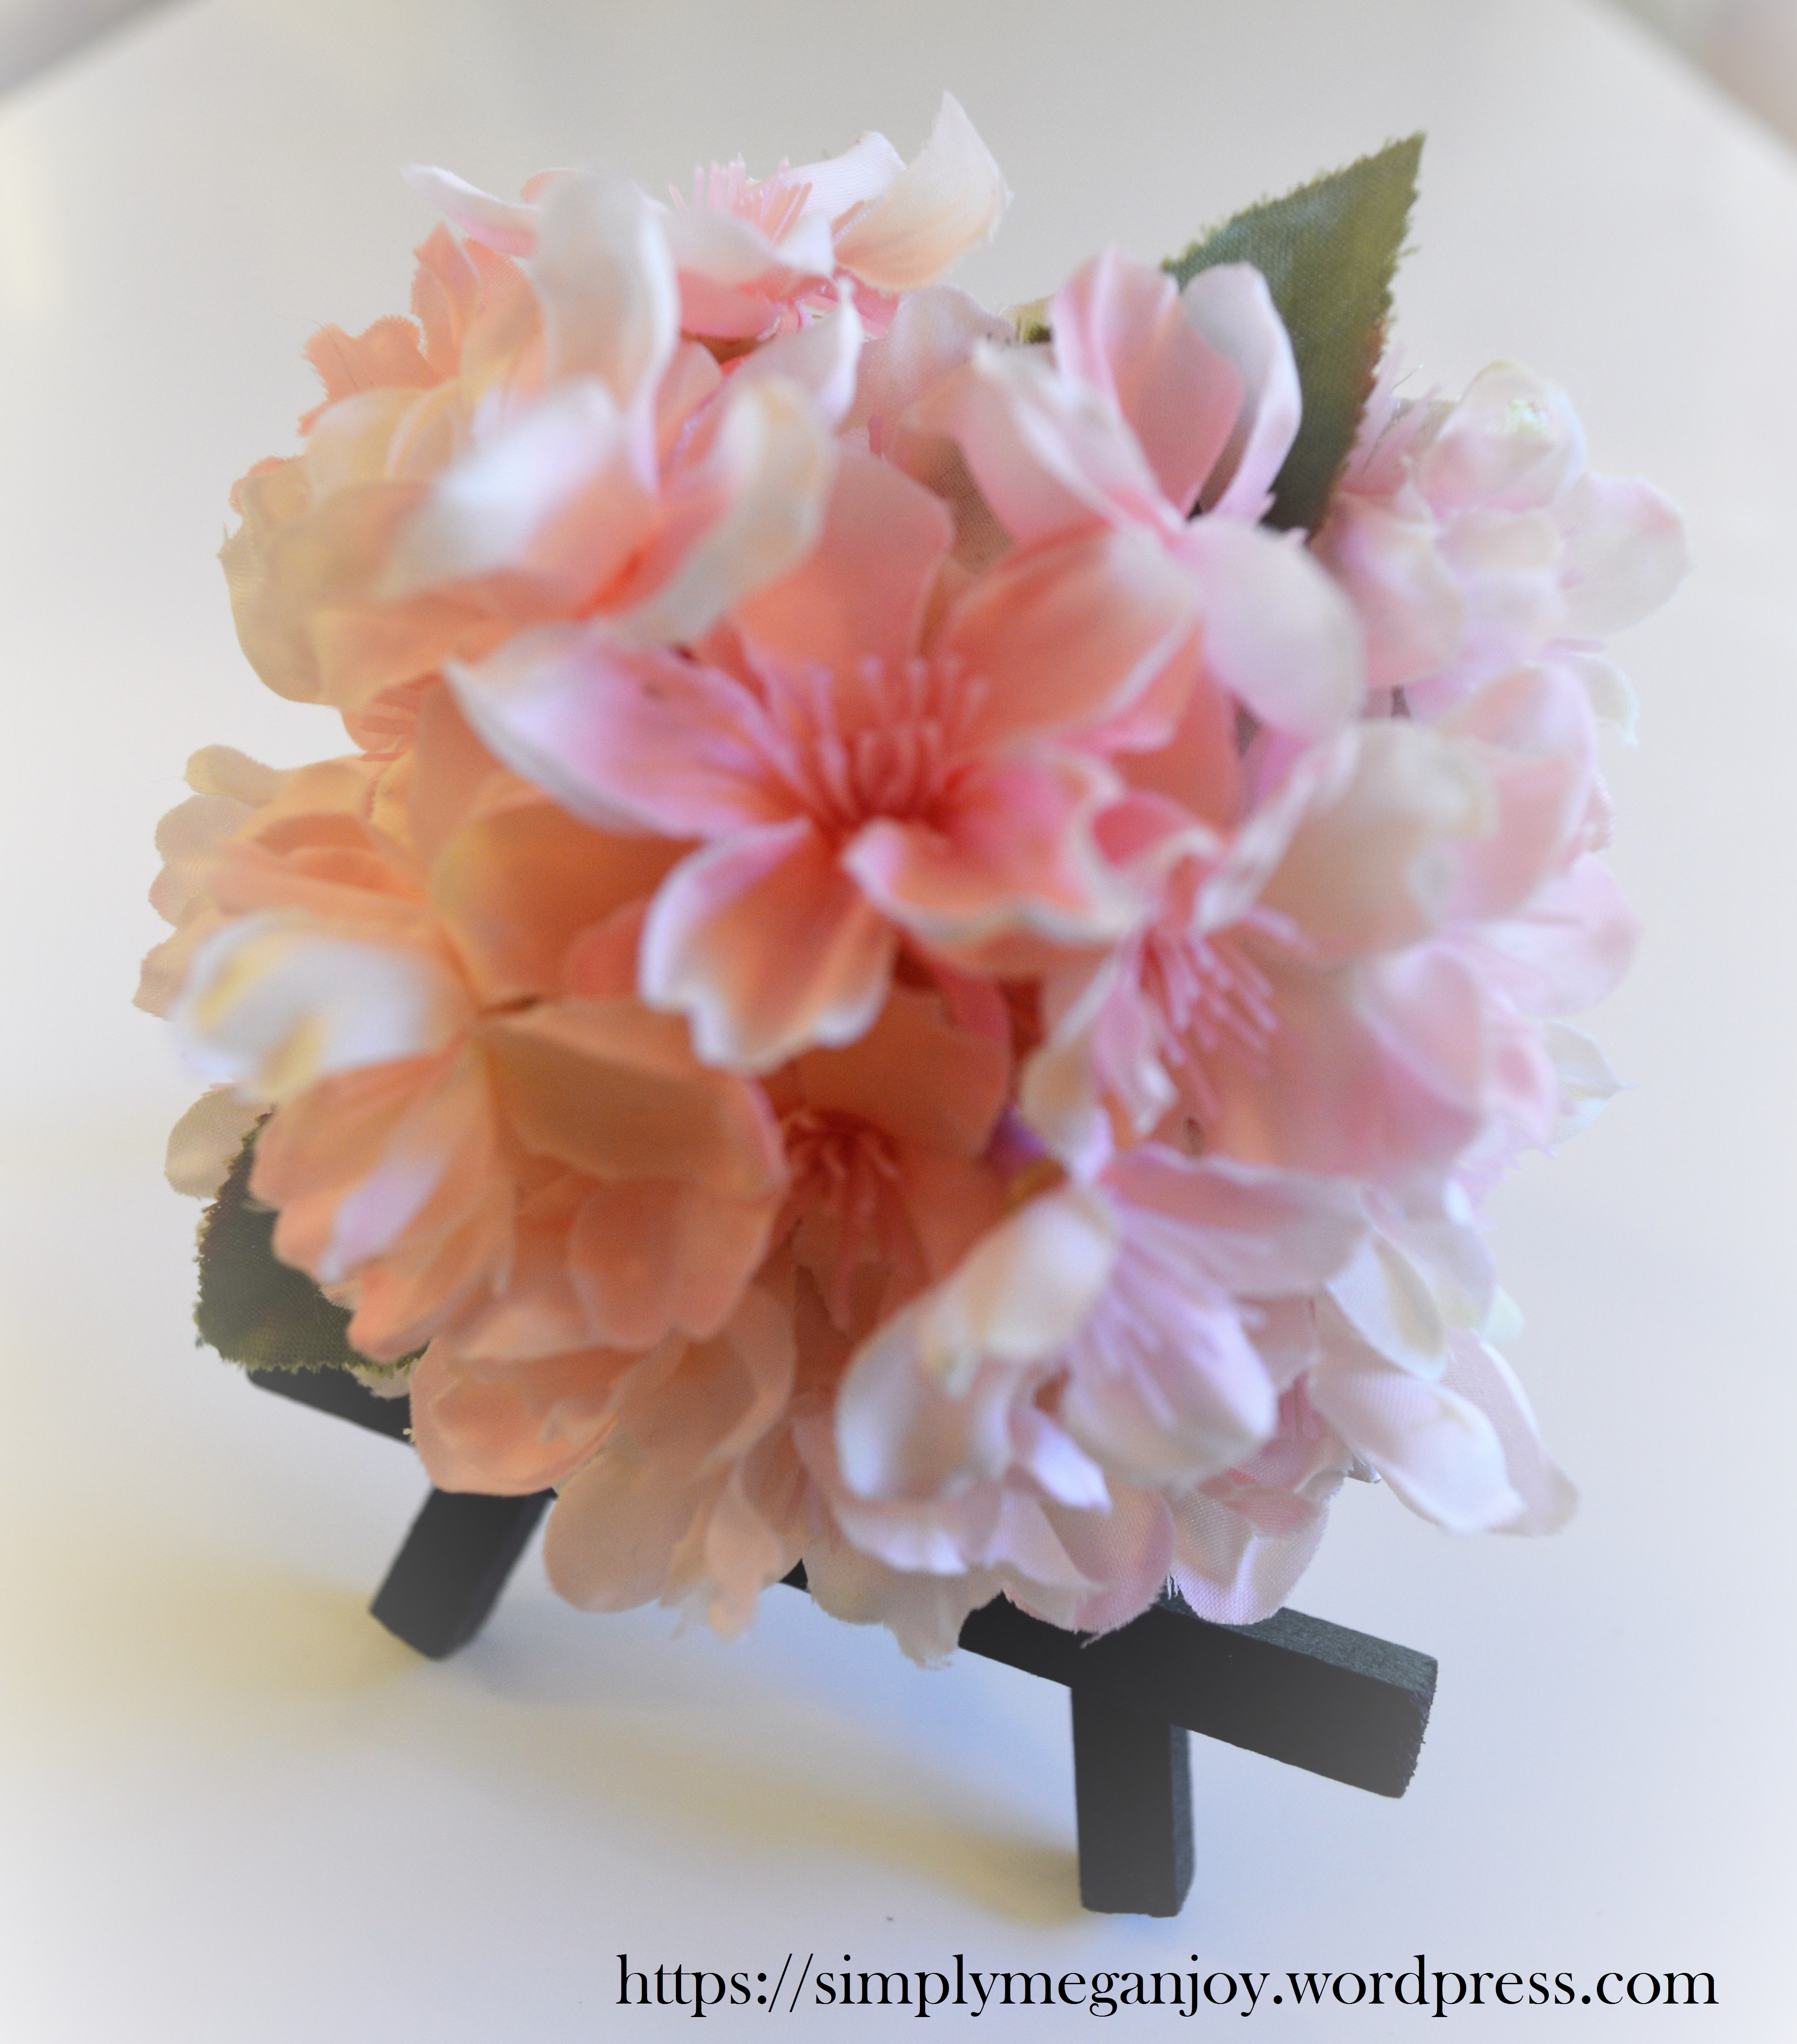 Mother_s Day - DIY Creation - Simply Megan Joy Blog 2